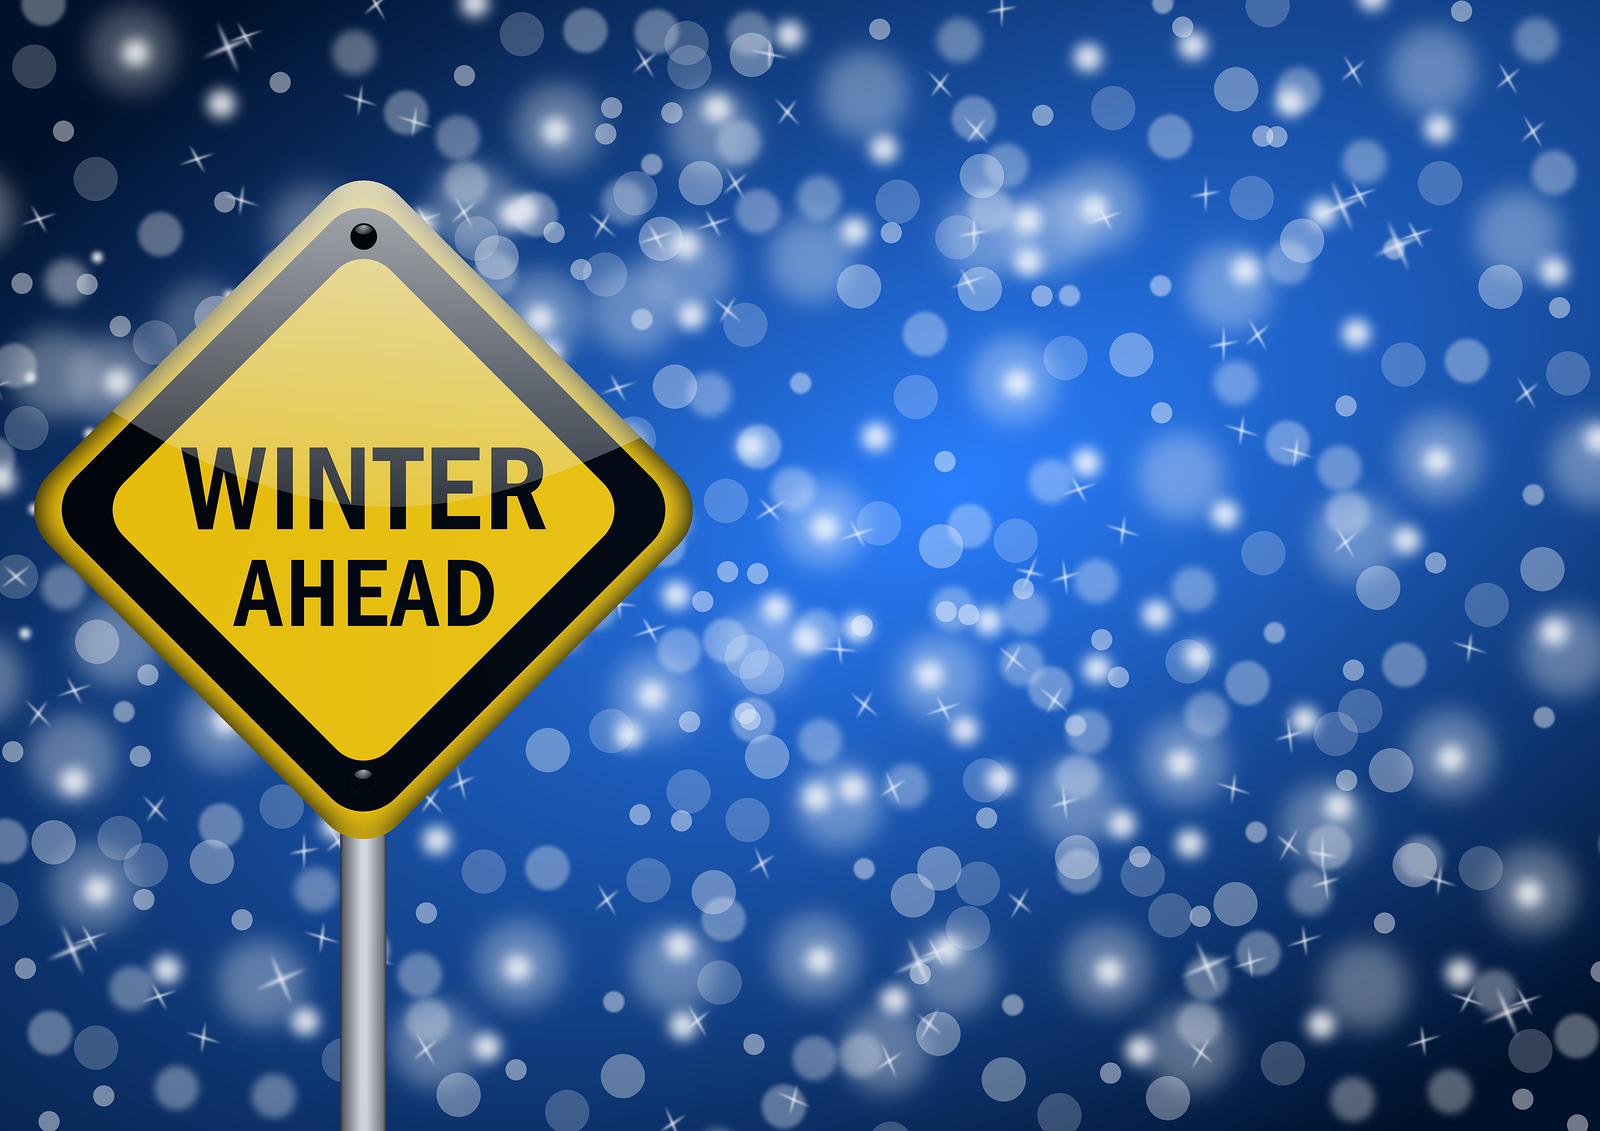 winterahead